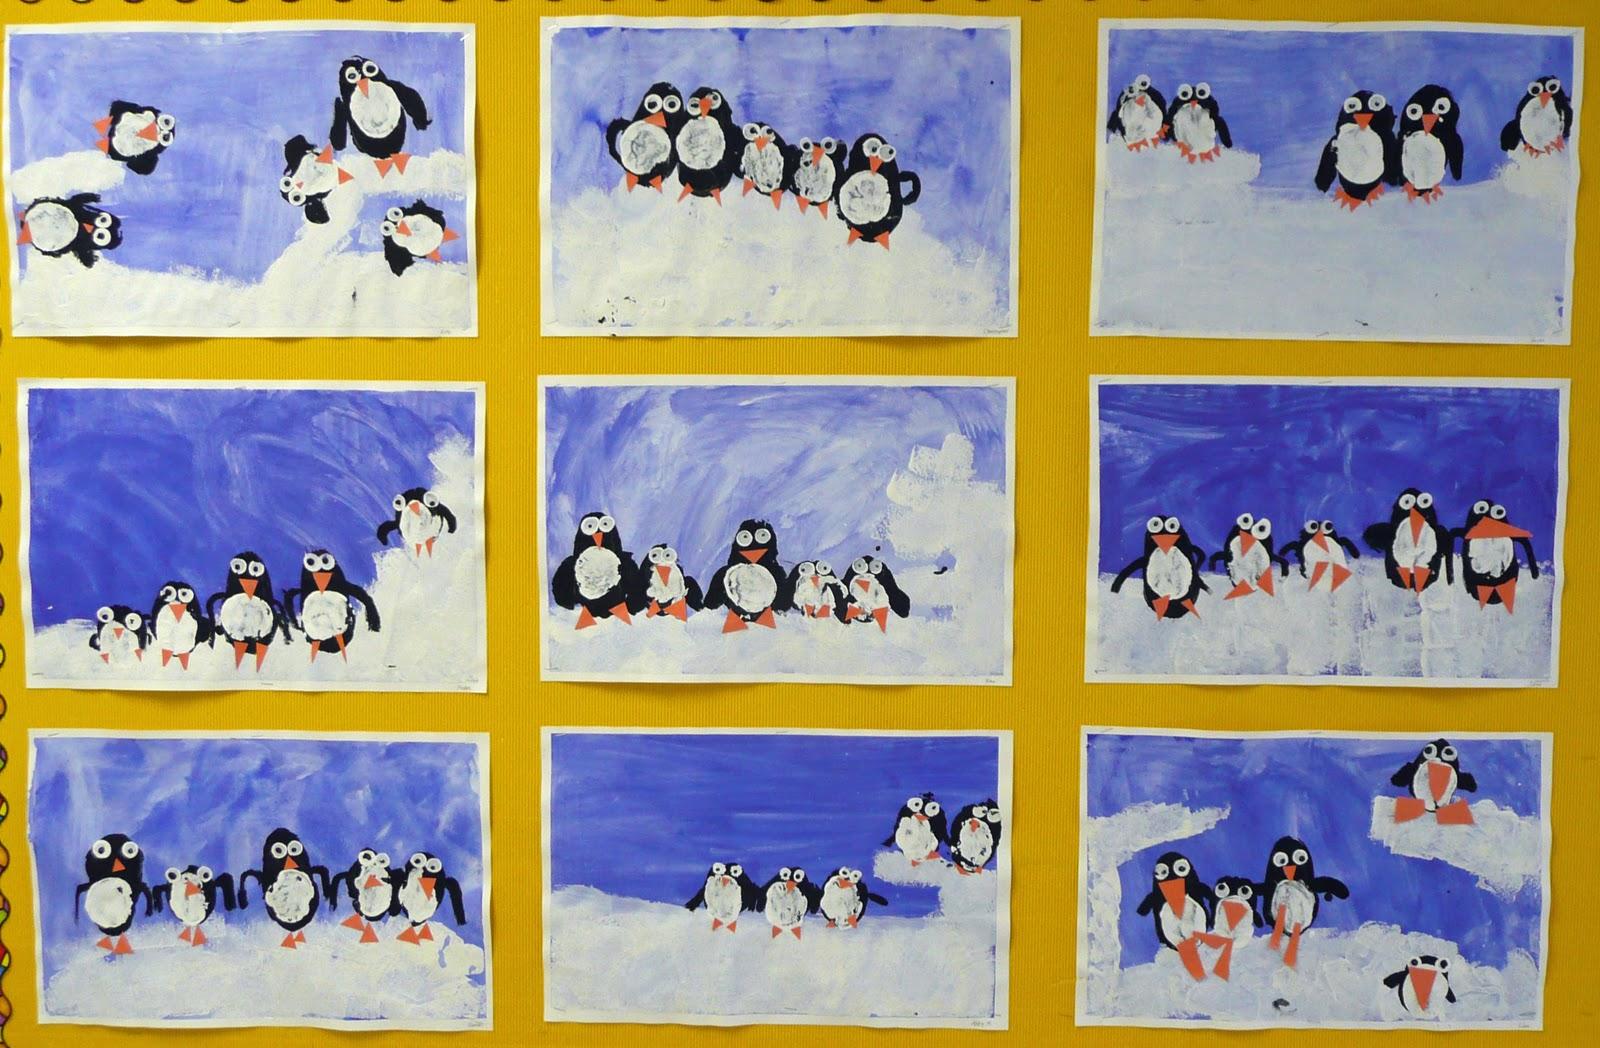 Images About Penguins